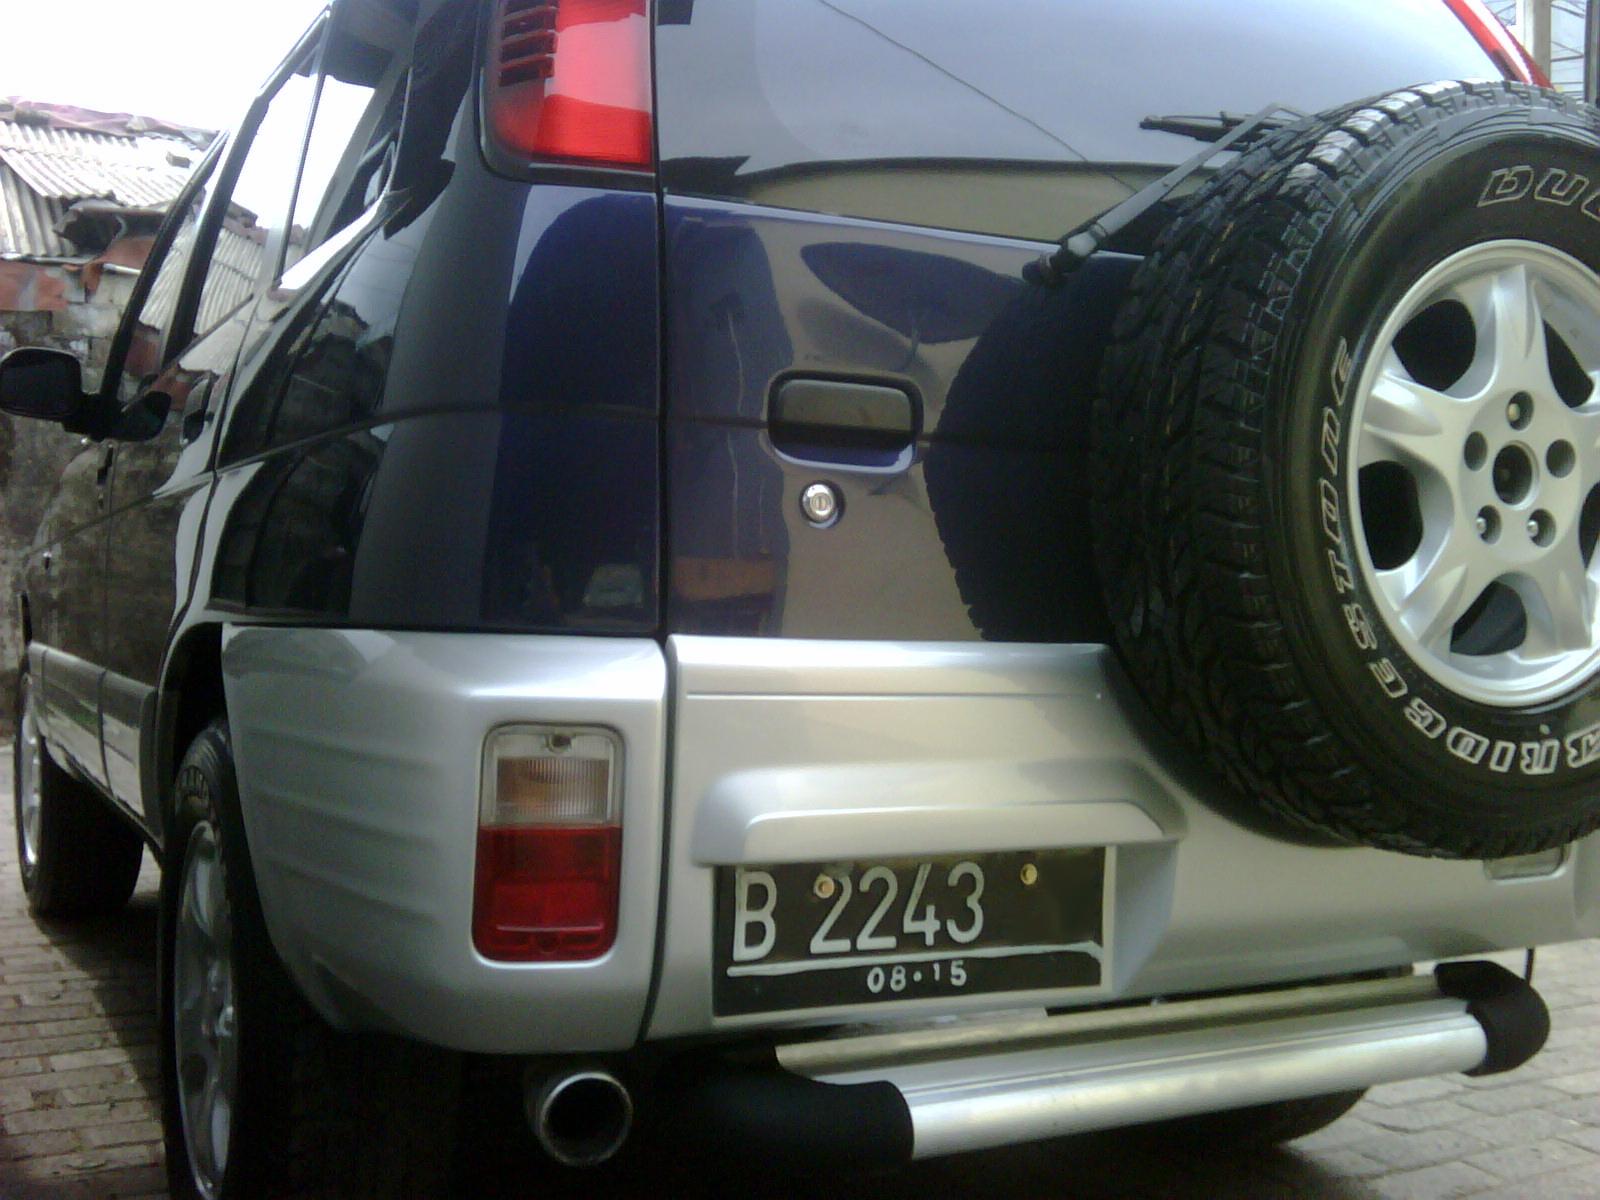 2000 Daihatsu Taruna CSX – GARASI 64